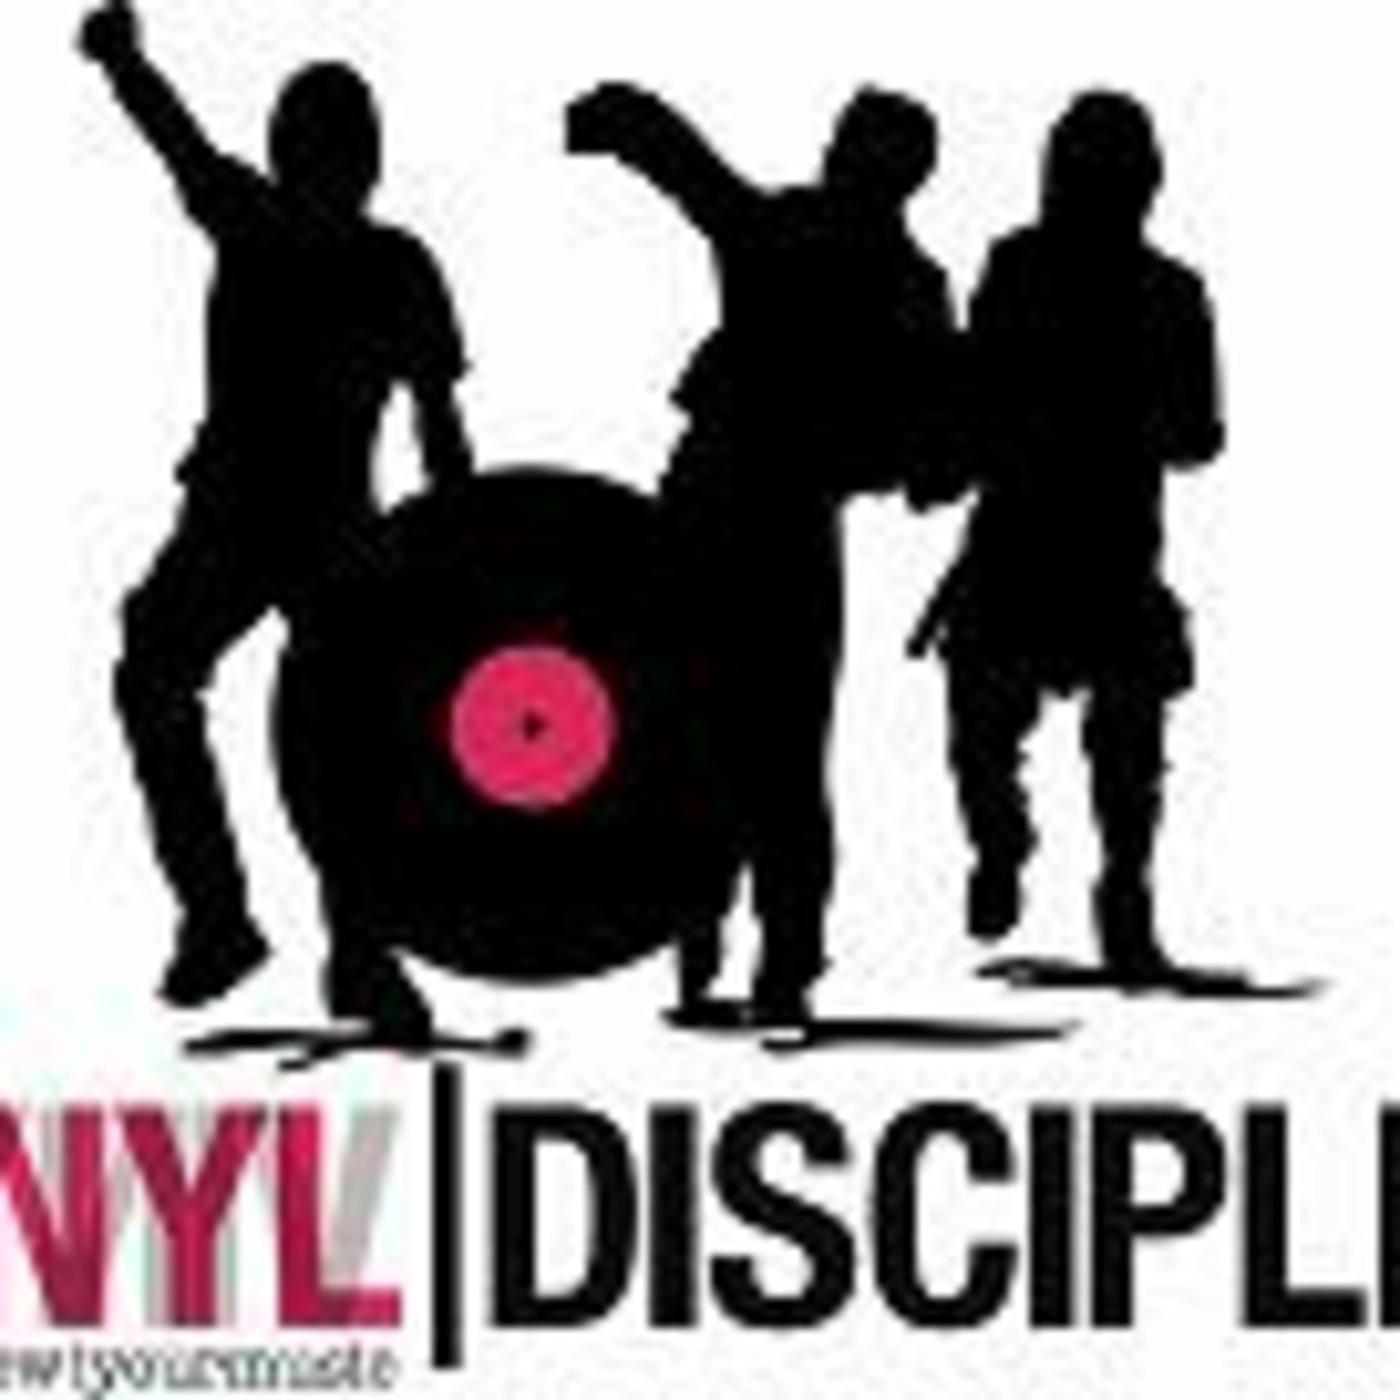 Vinyl Disciples: CHEW YOUR MUSIC!